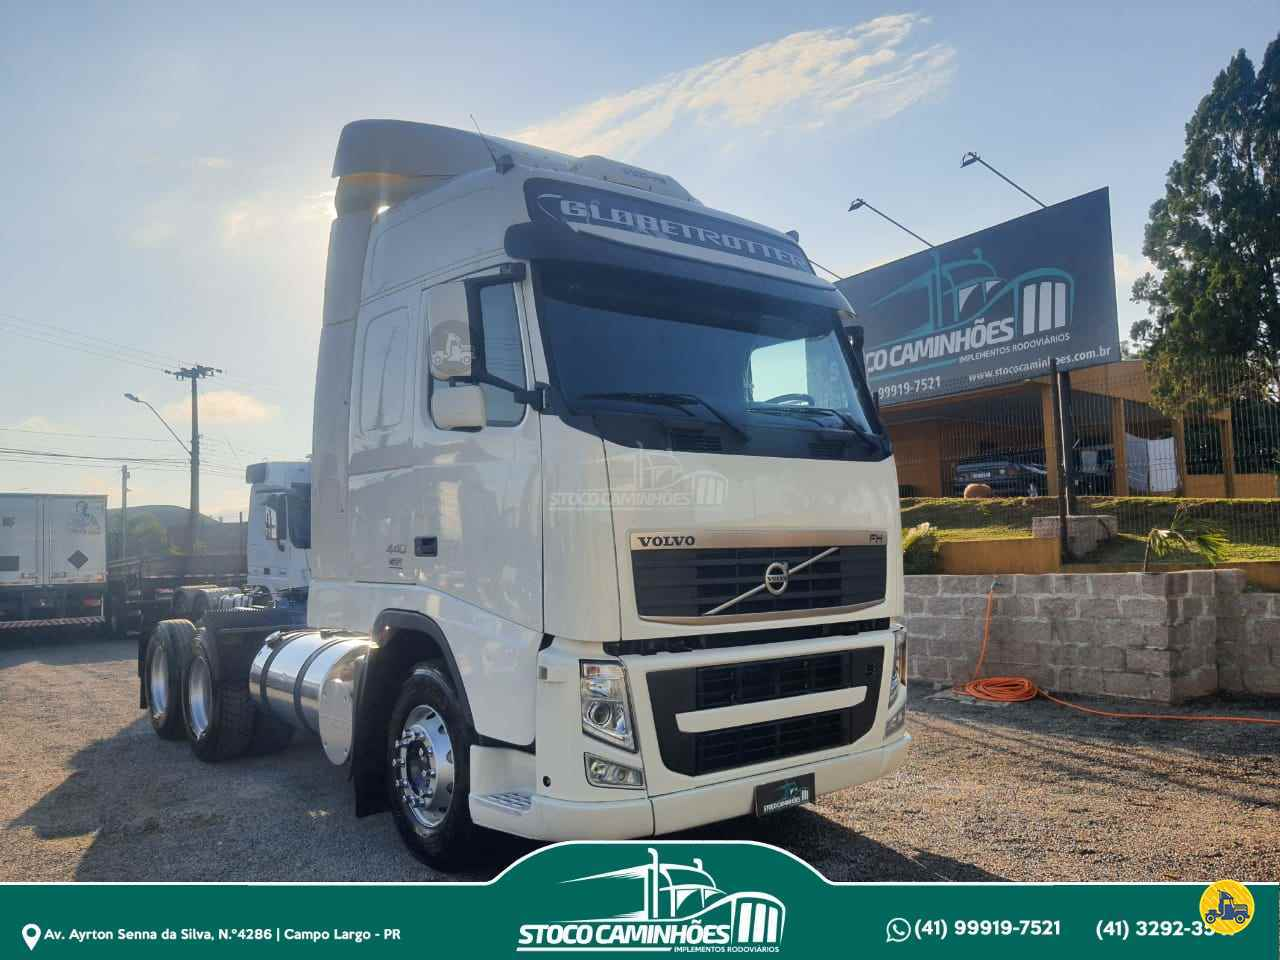 CAMINHAO VOLVO VOLVO FH 440 Cavalo Mecânico Truck 6x2 Stoco Caminhões  CAMPO LARGO PARANÁ PR